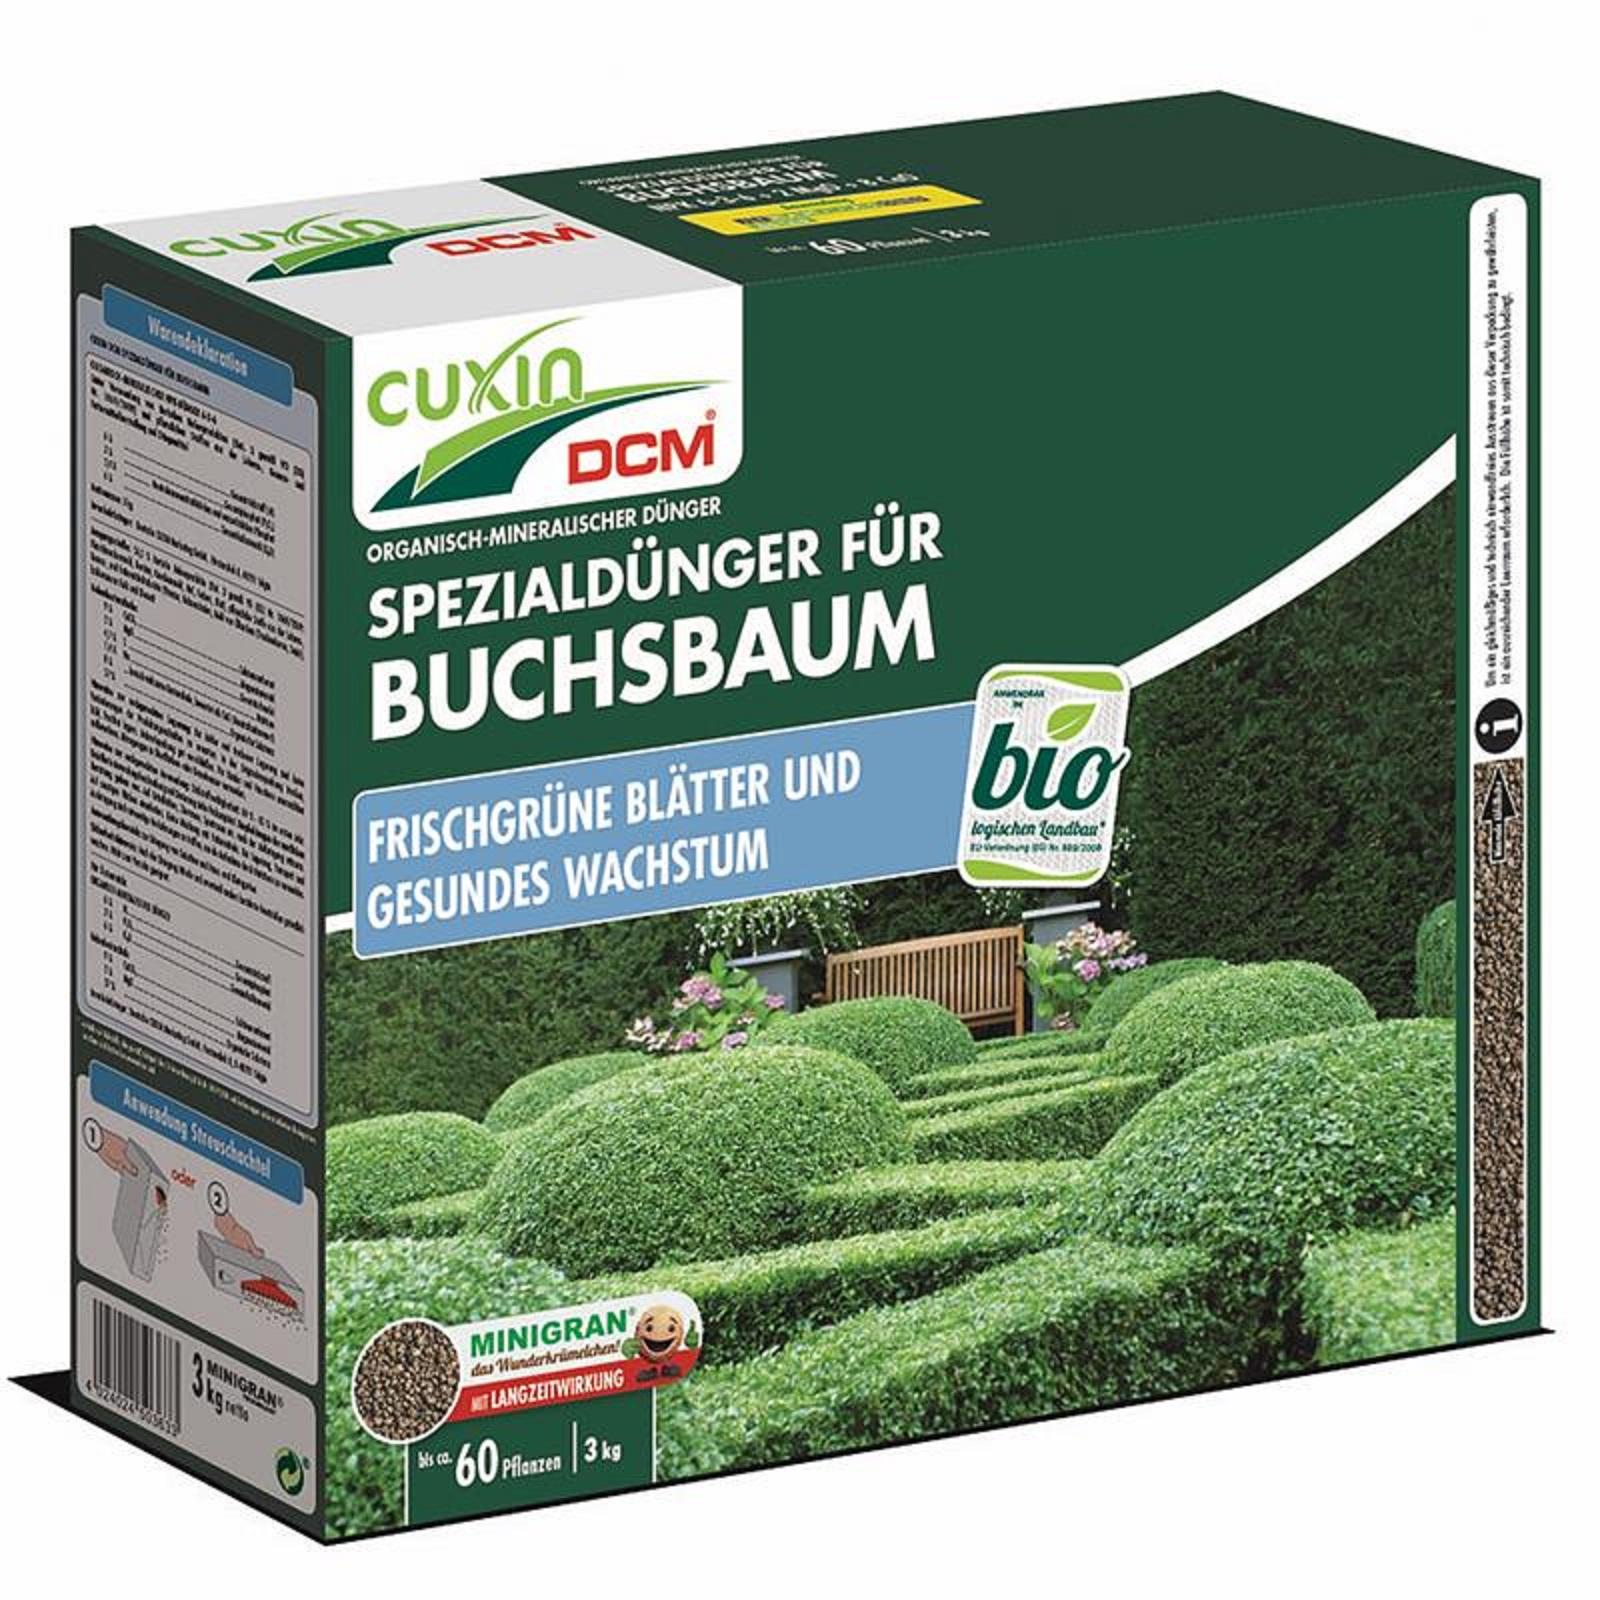 Cuxin Buchsbaum Spezialdünger 3 kg Minigran Dünger